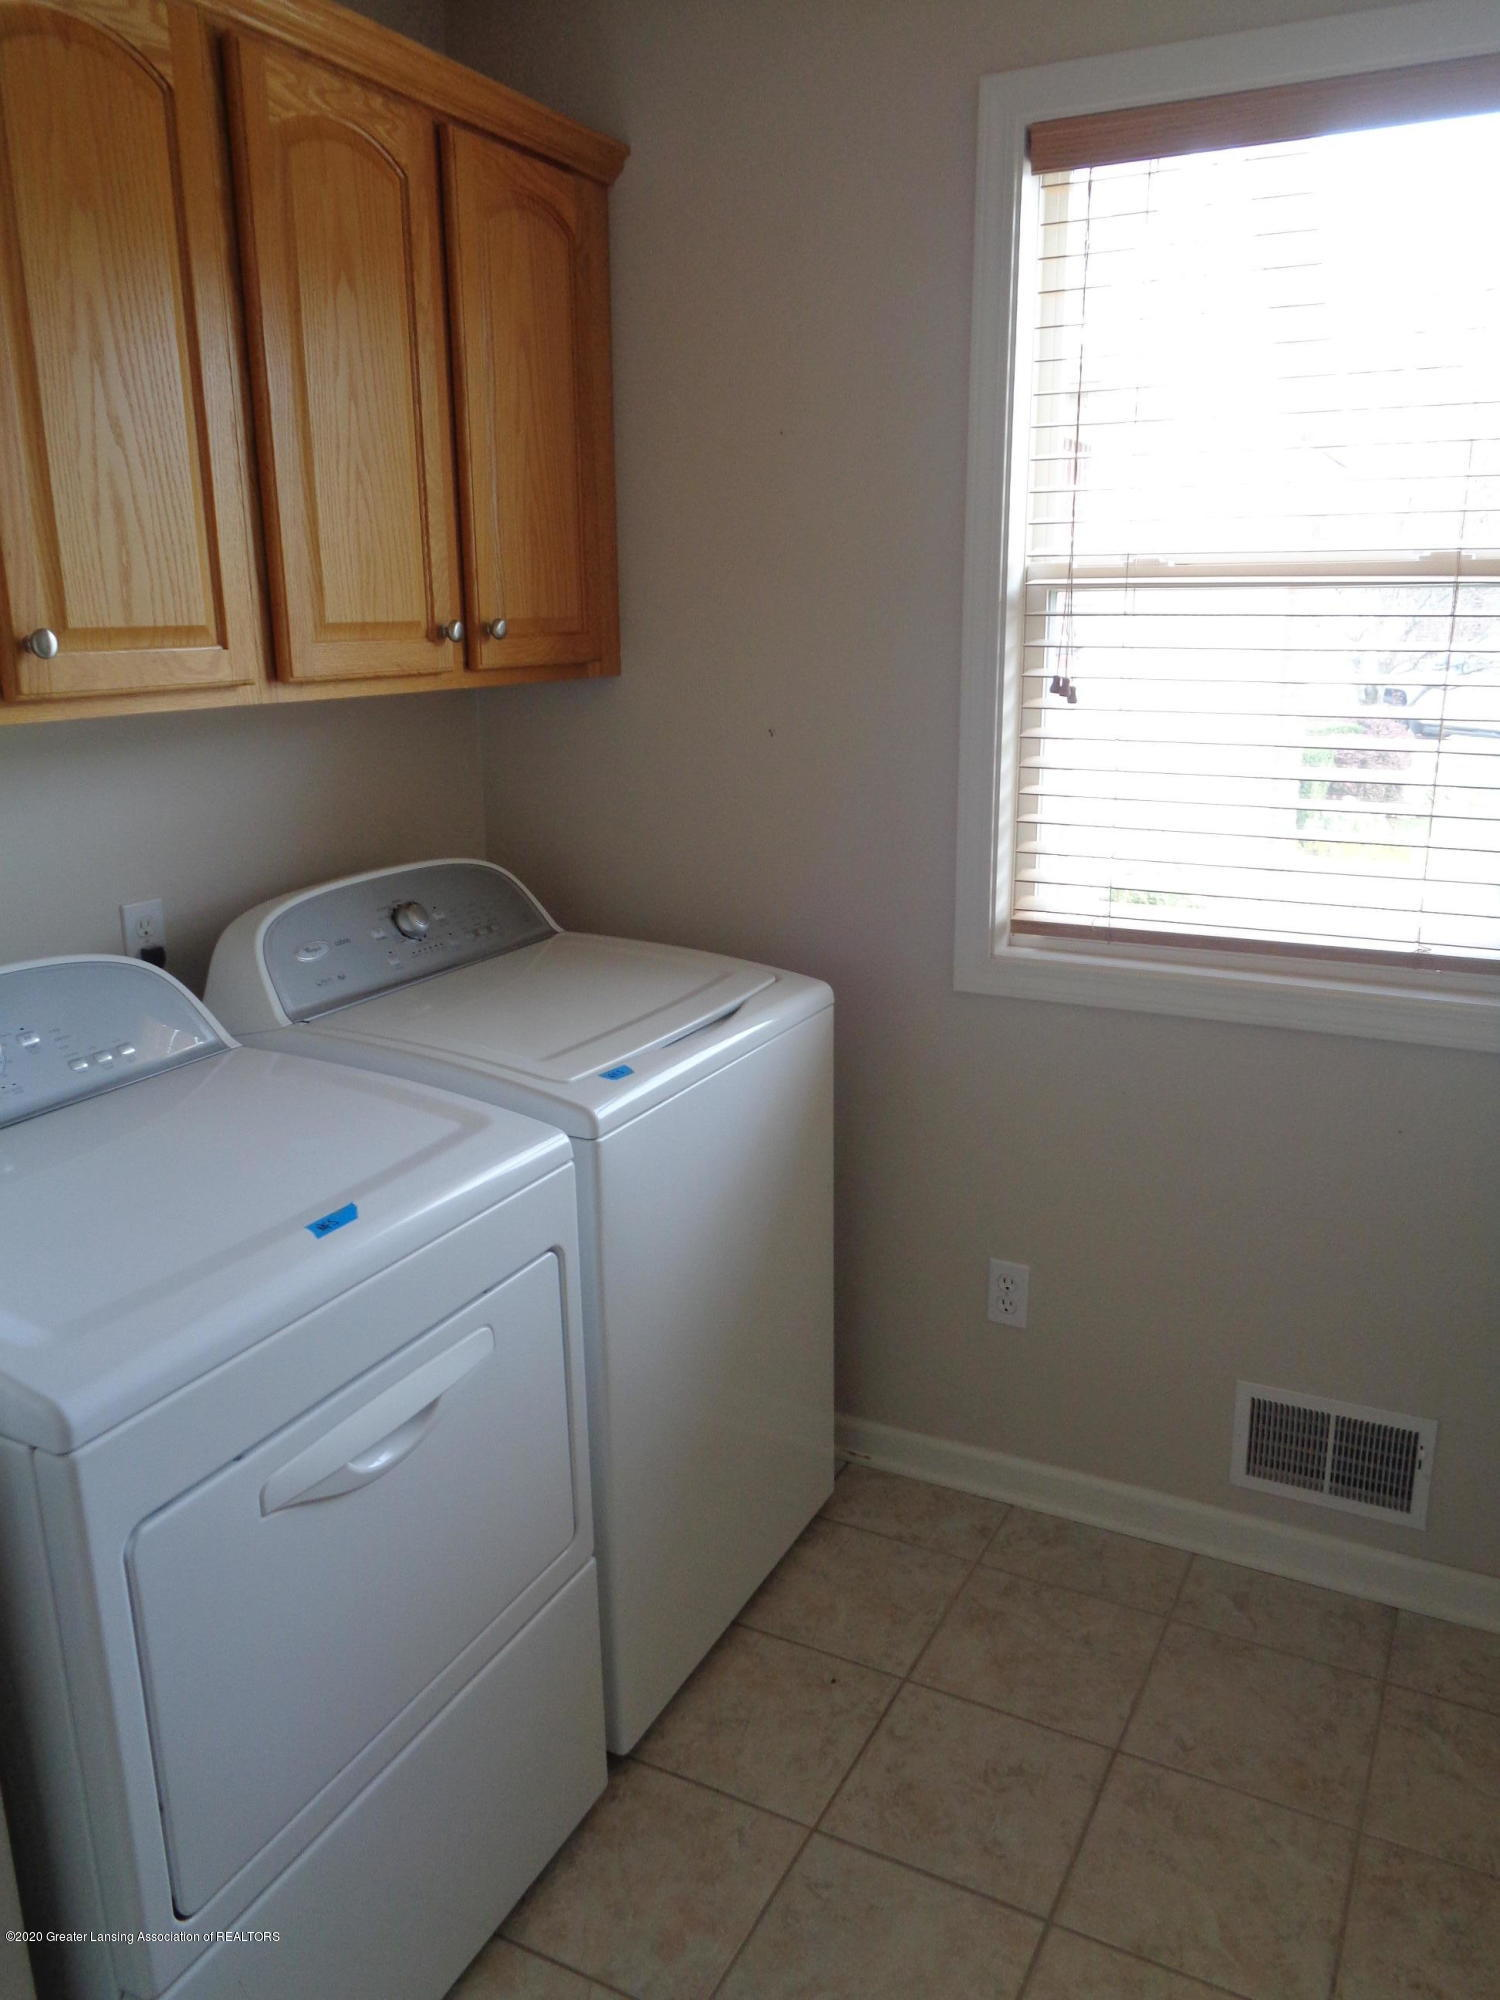 2067 Wovenheart Dr - woven heart laundry - 9